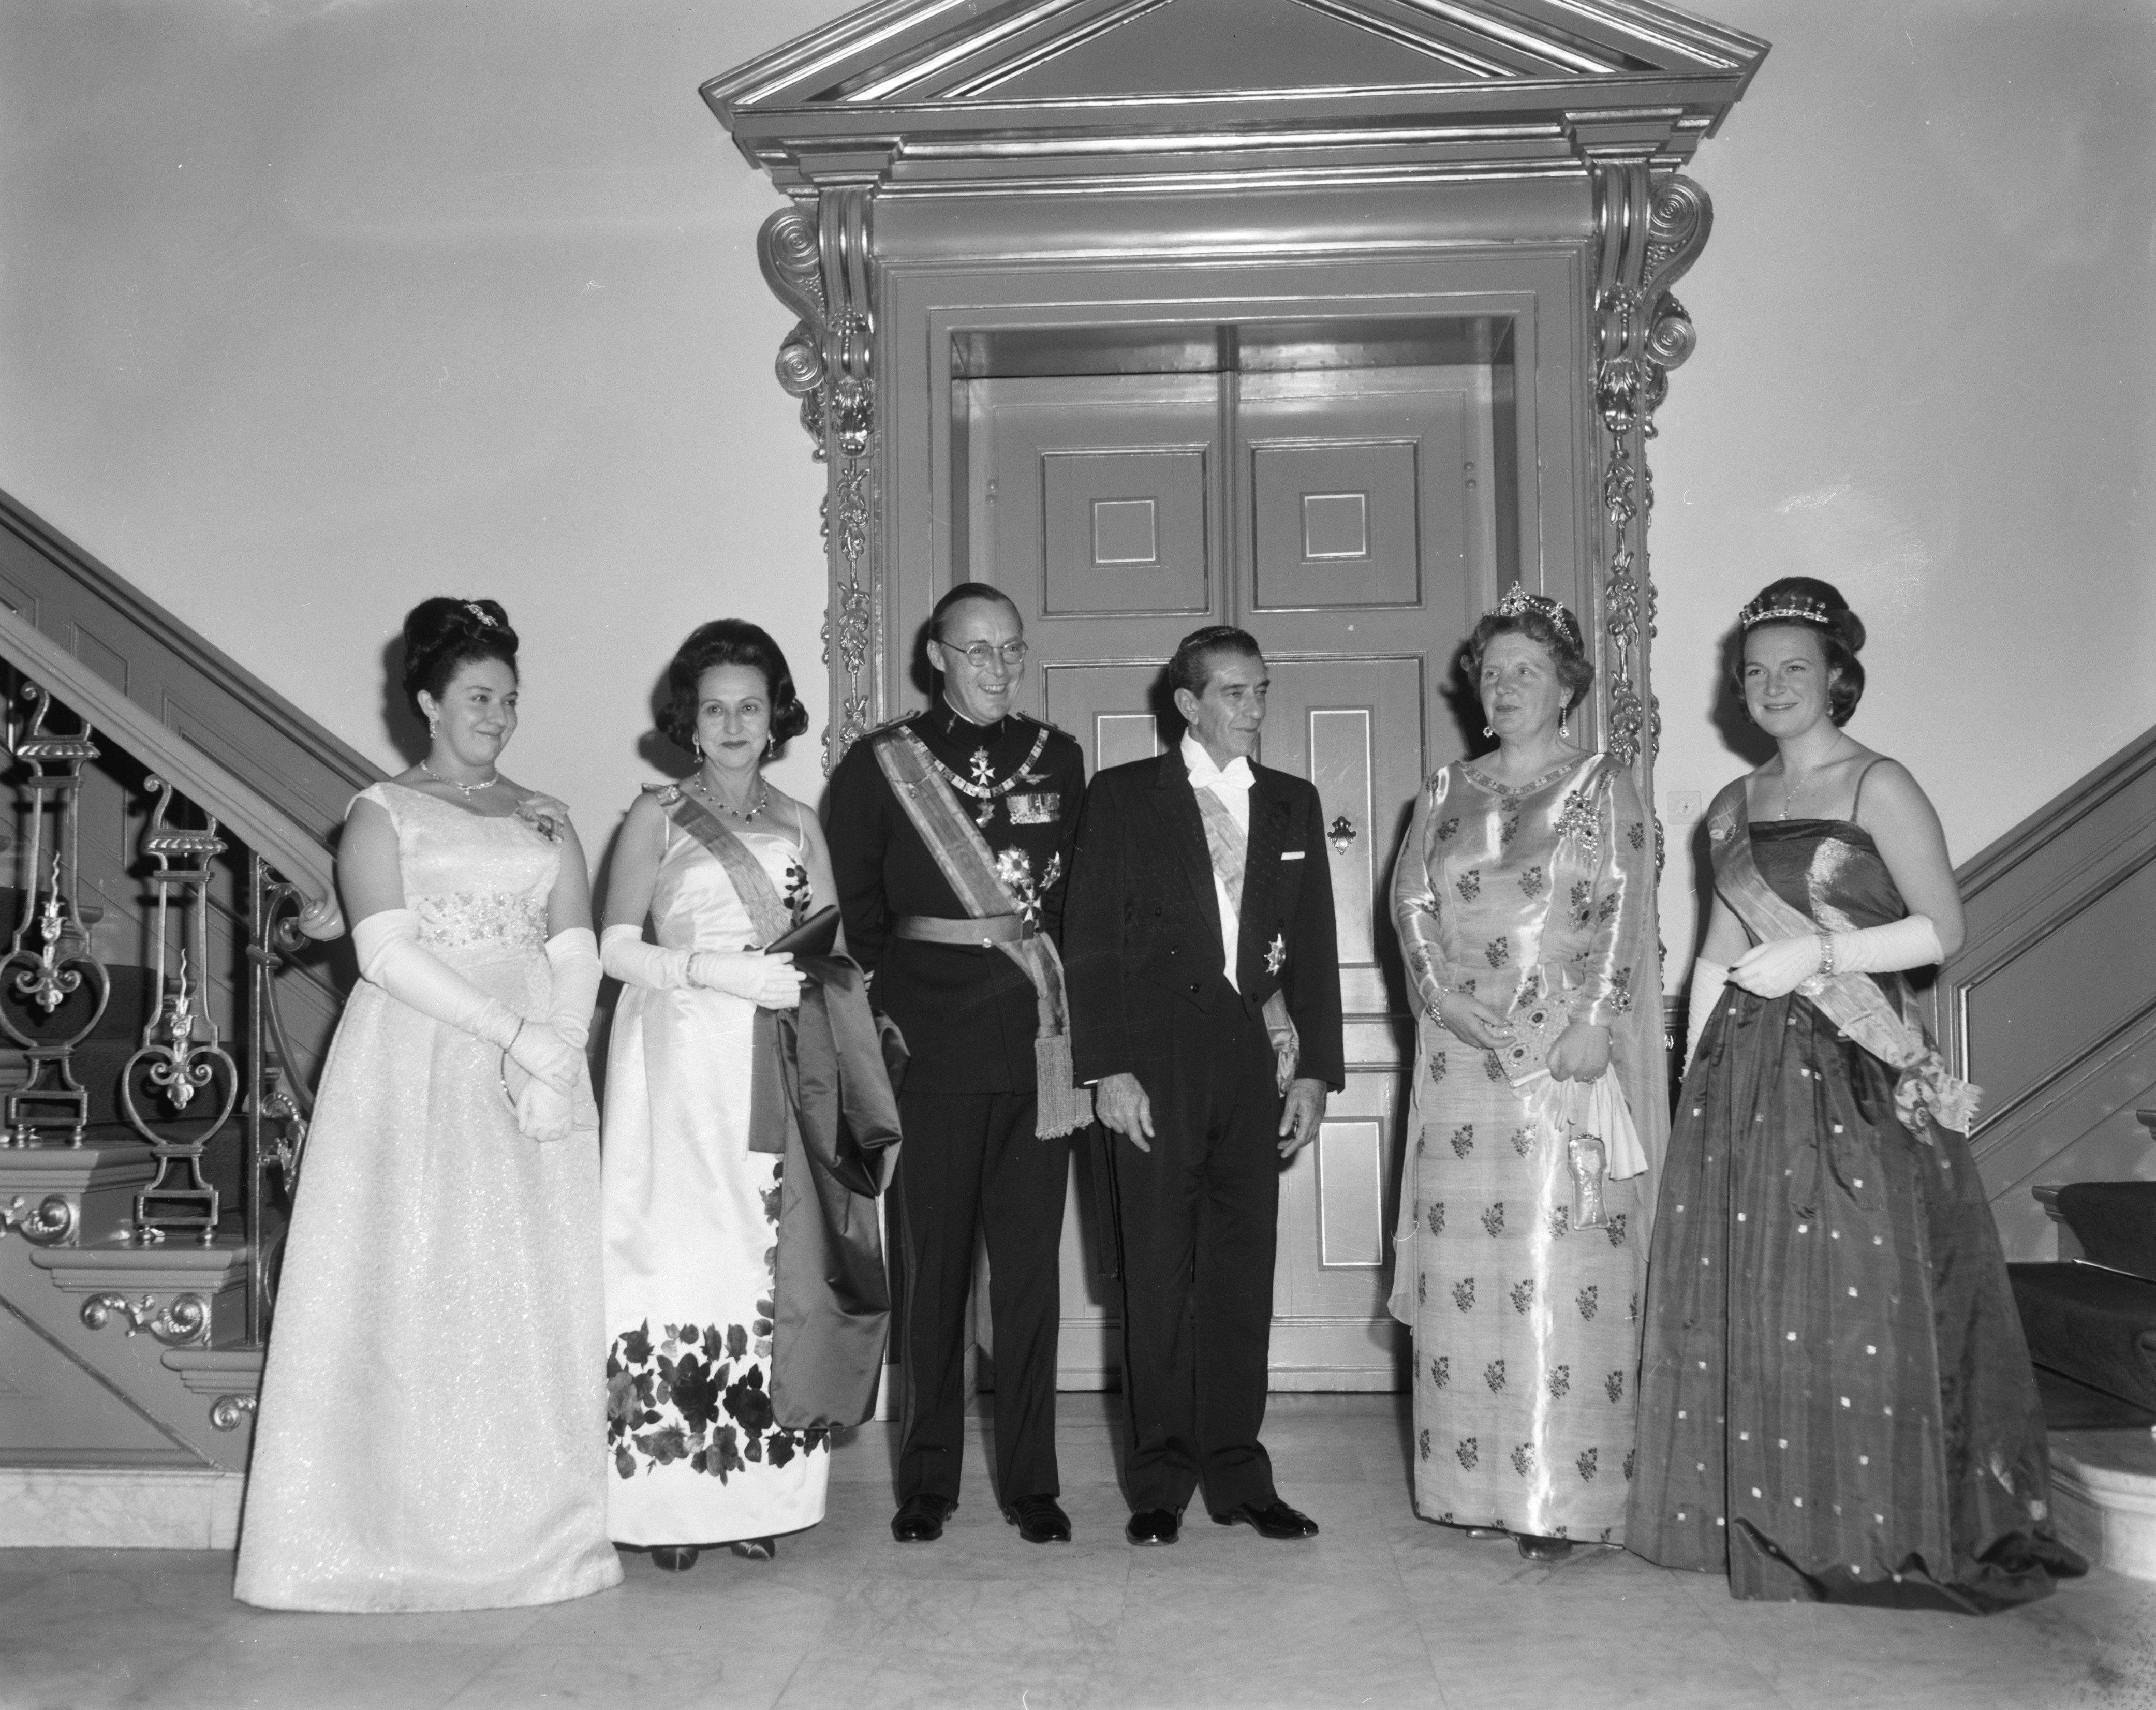 File:Bezoek President van Mexico President Lopez . De hoge gasten in avondtoilet gepo, Bestanddeelnr 915-0034.jpg